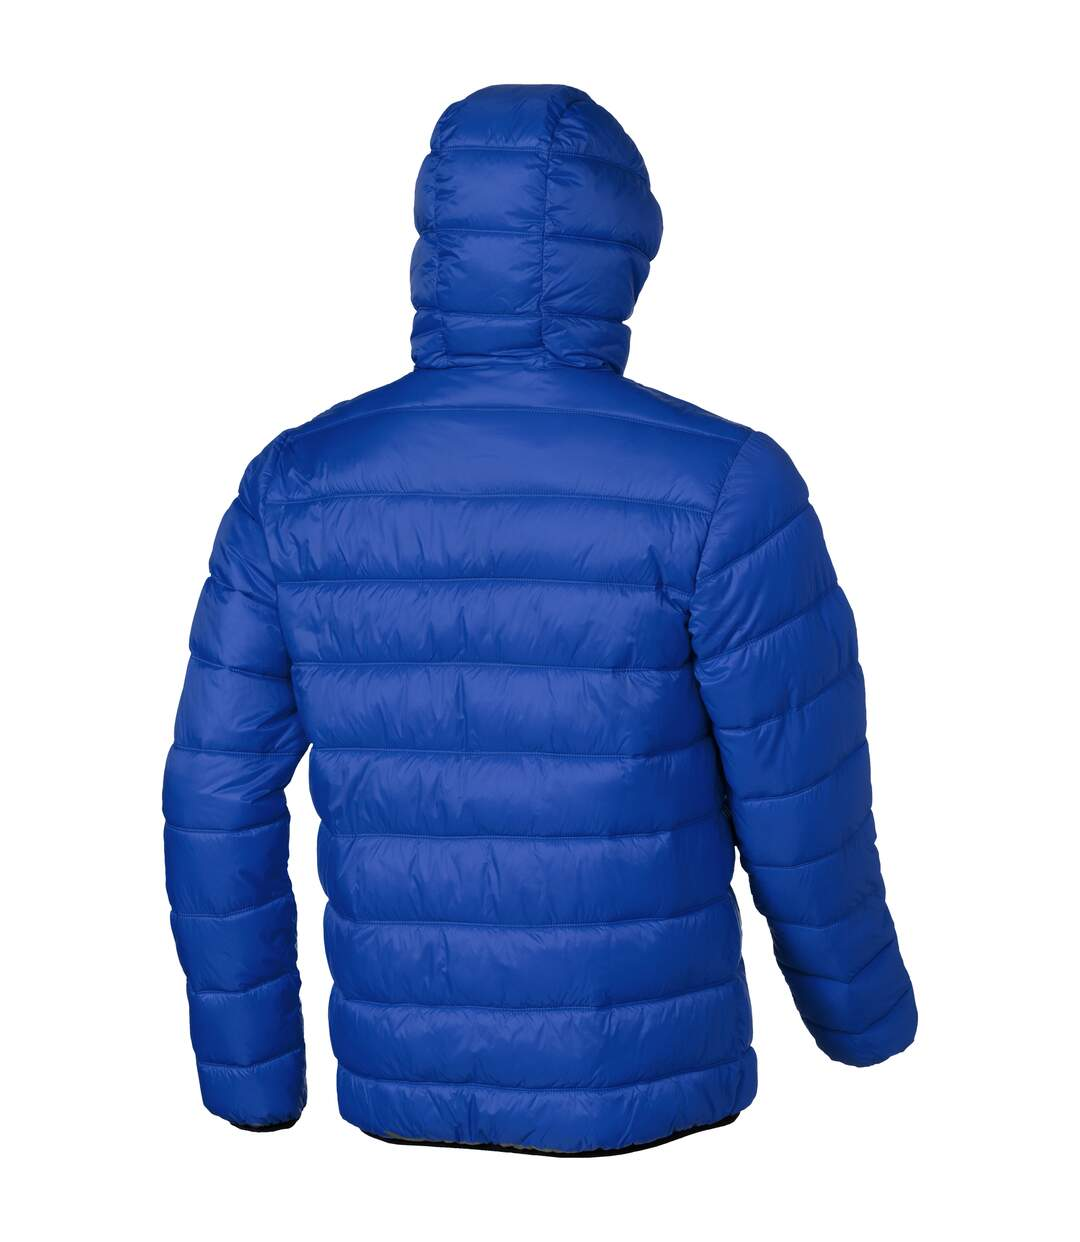 Elevate Mens Norquay Insulated Jacket (Blue) - UTPF1916